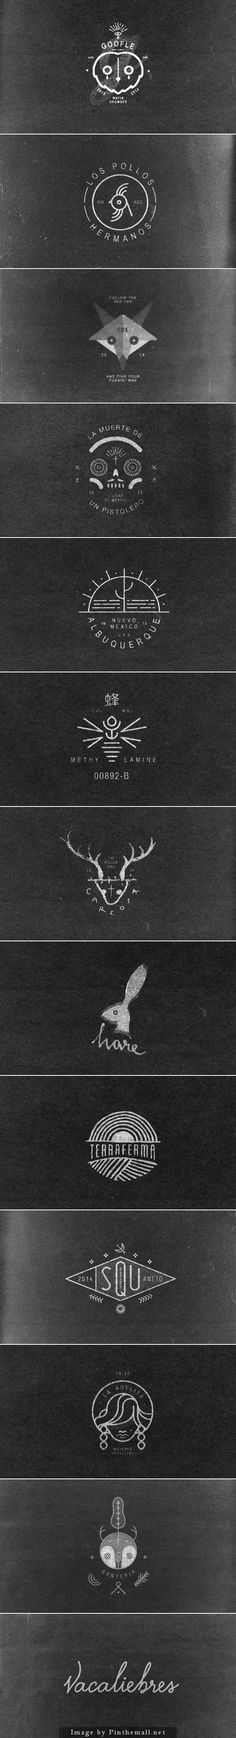 Logos | Designer: Vacaliebres